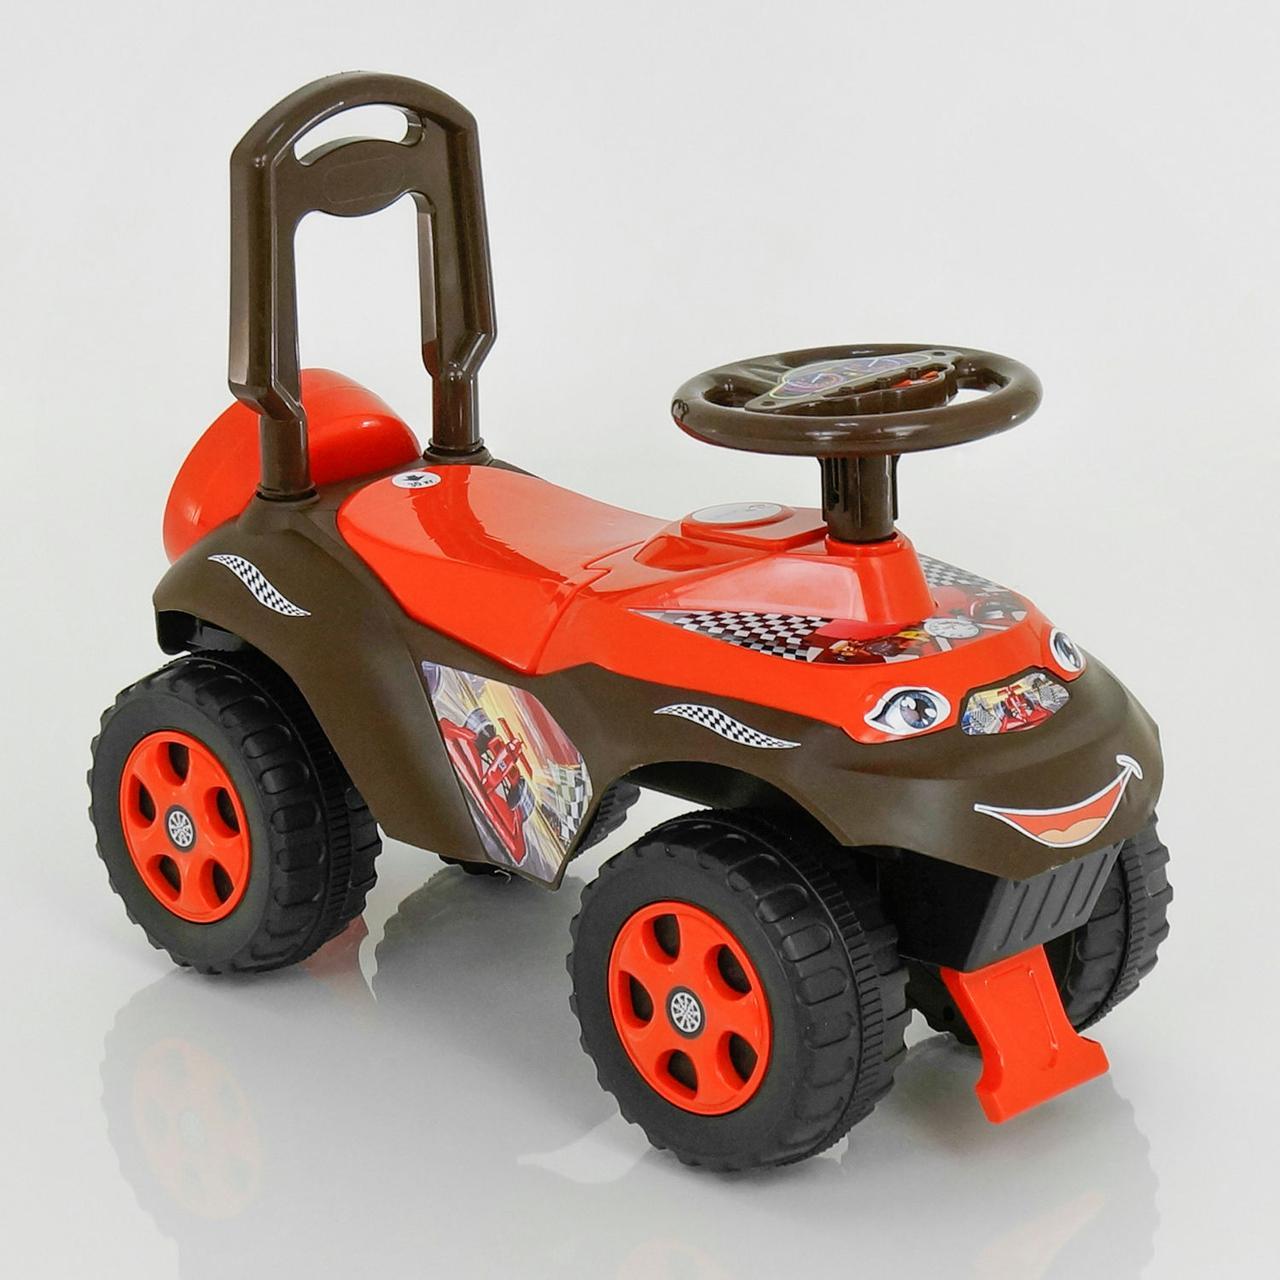 Толокар каталка Червоний - Машинка толокар для дитини